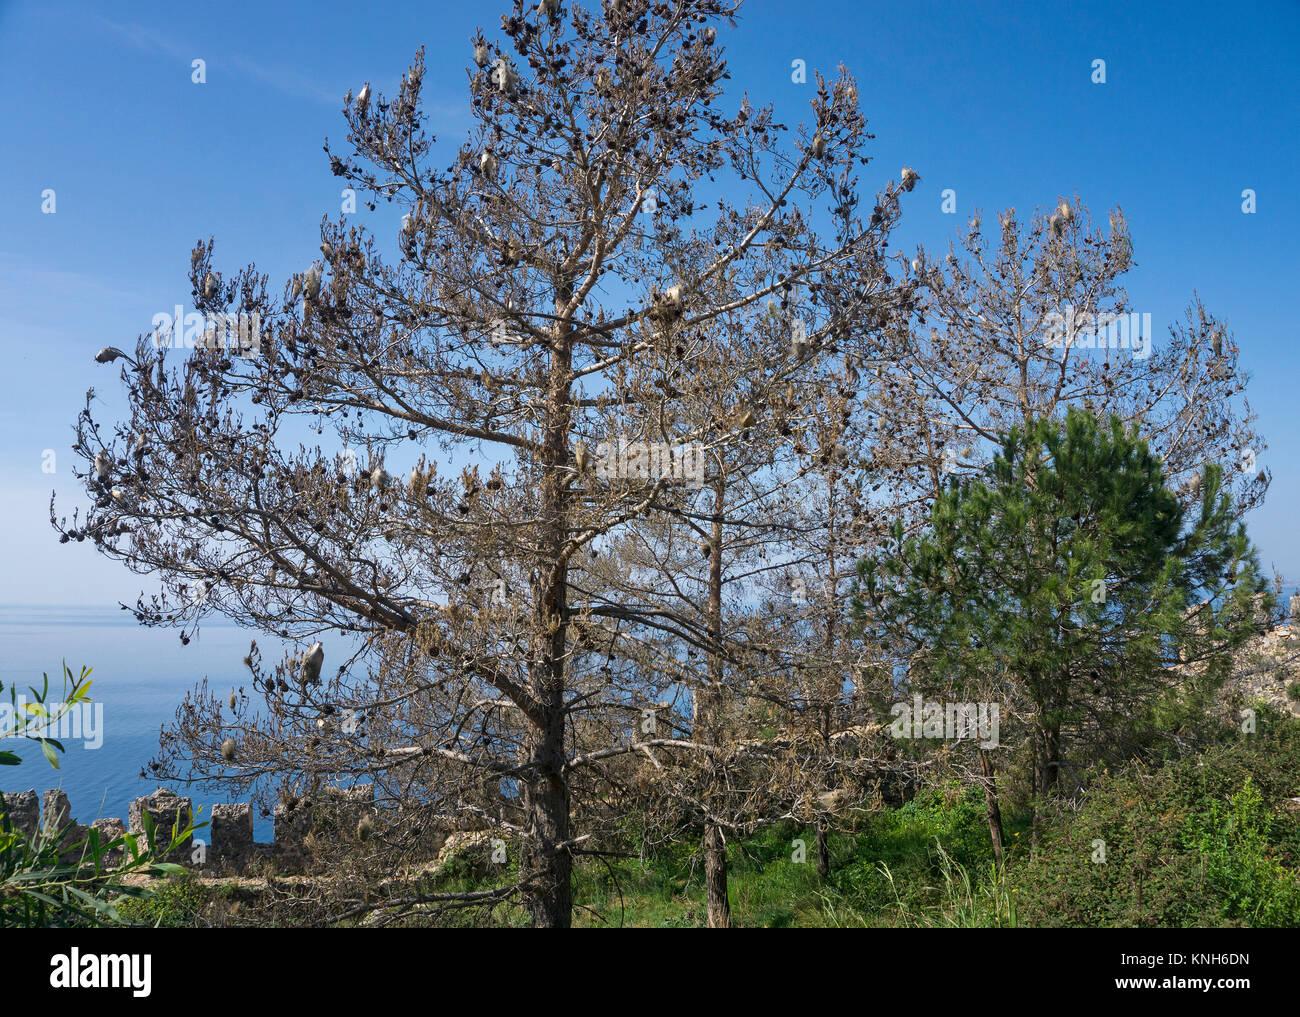 Nests of  Pine Processionary larvae (Thaumetopoea pityocampa) on a pine (Pinus pinea), Alanya, turkish riviera, - Stock Image